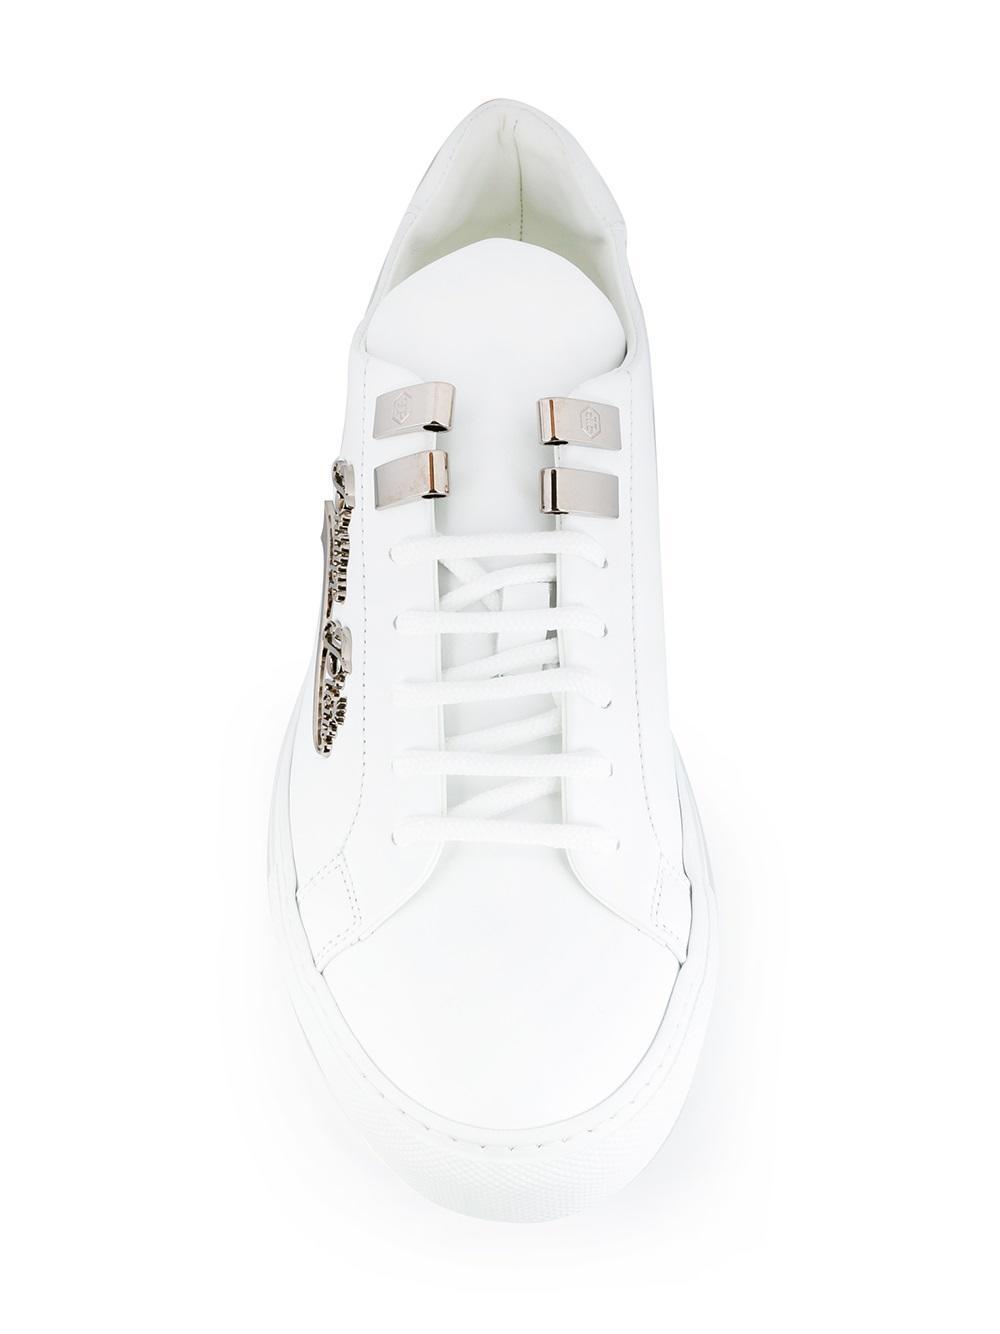 Philipp Plein Leather 'rams' Sneakers in White